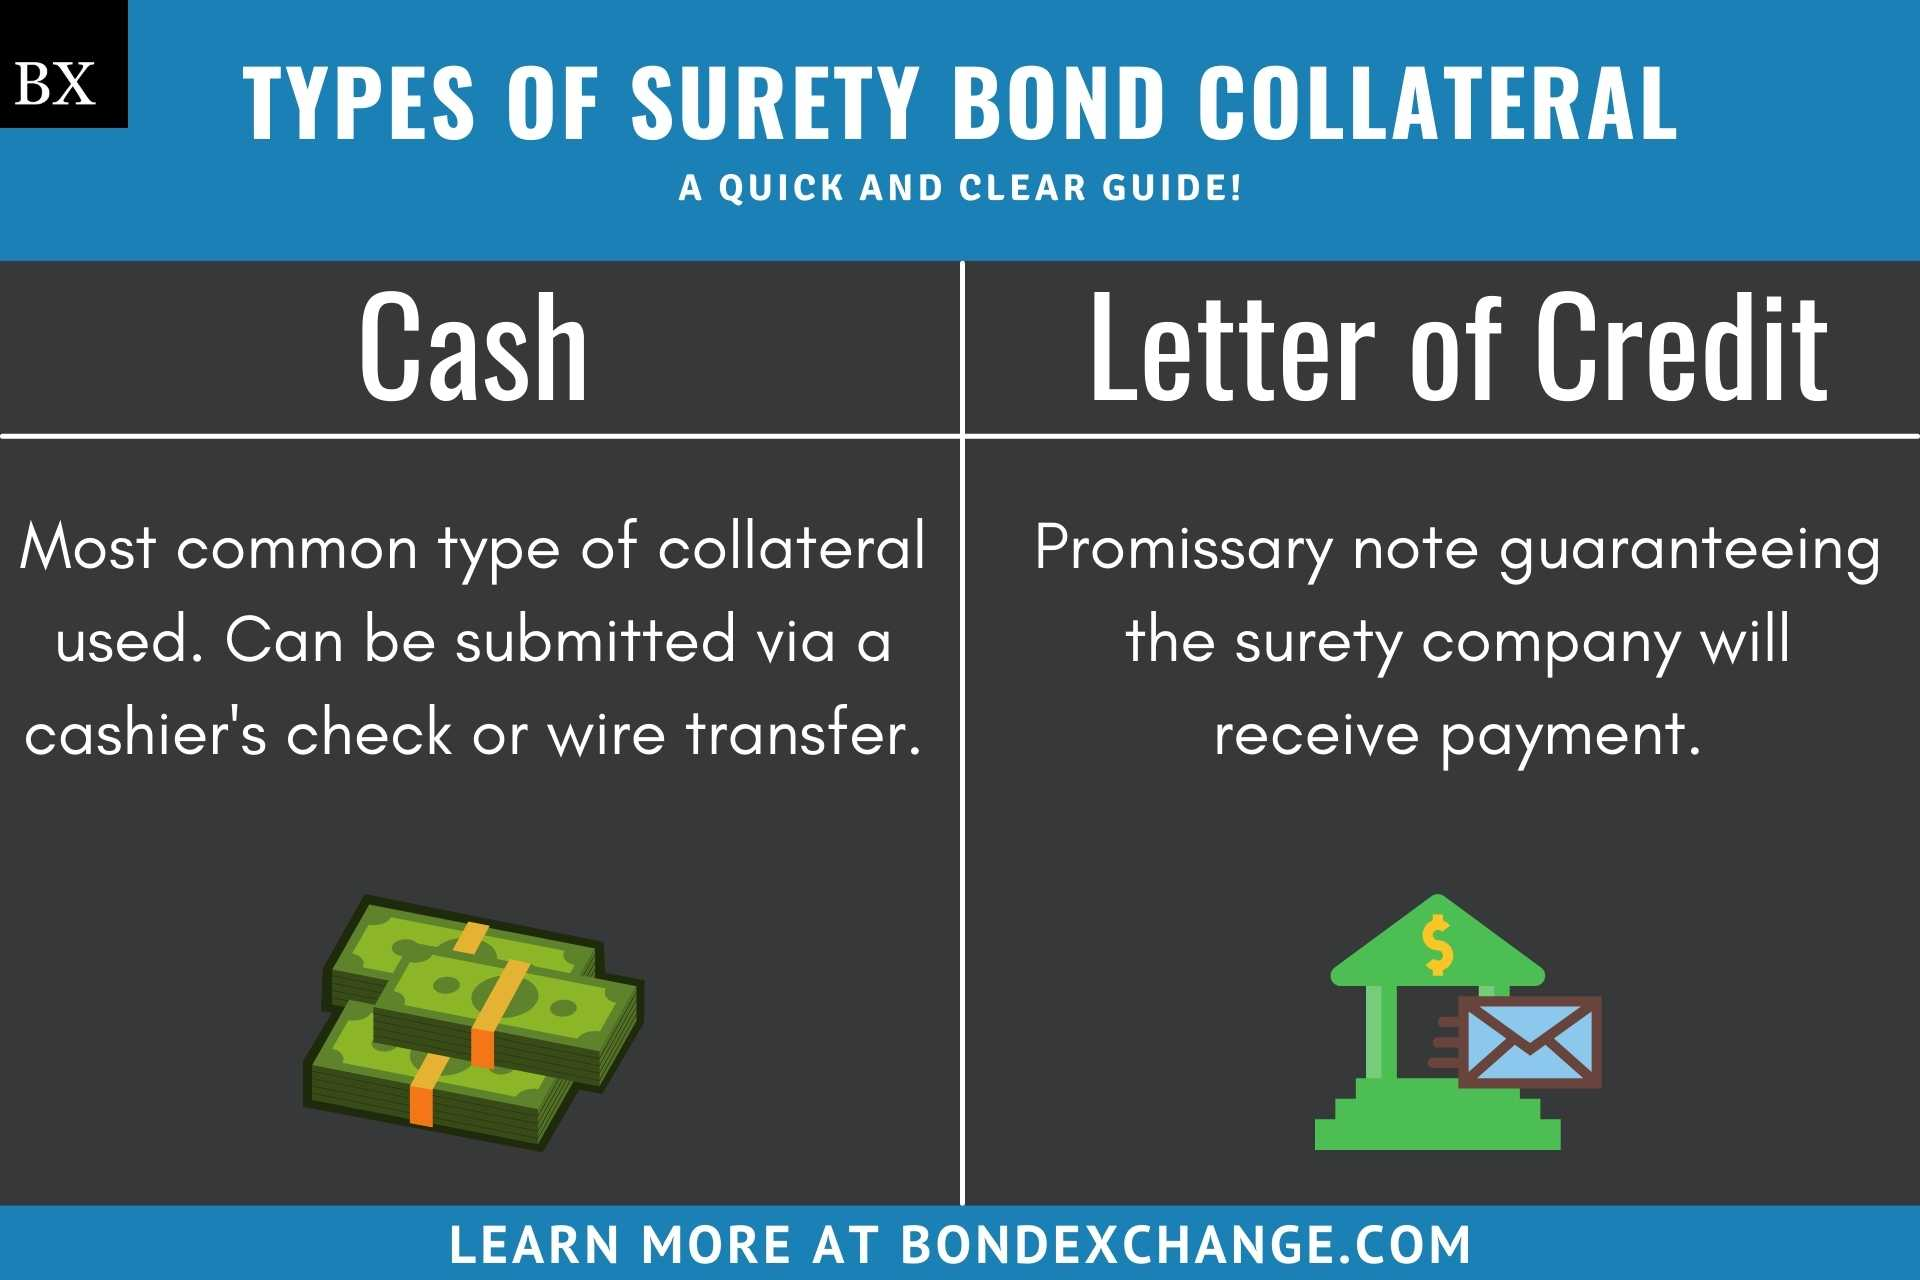 Surety Bond Collateral